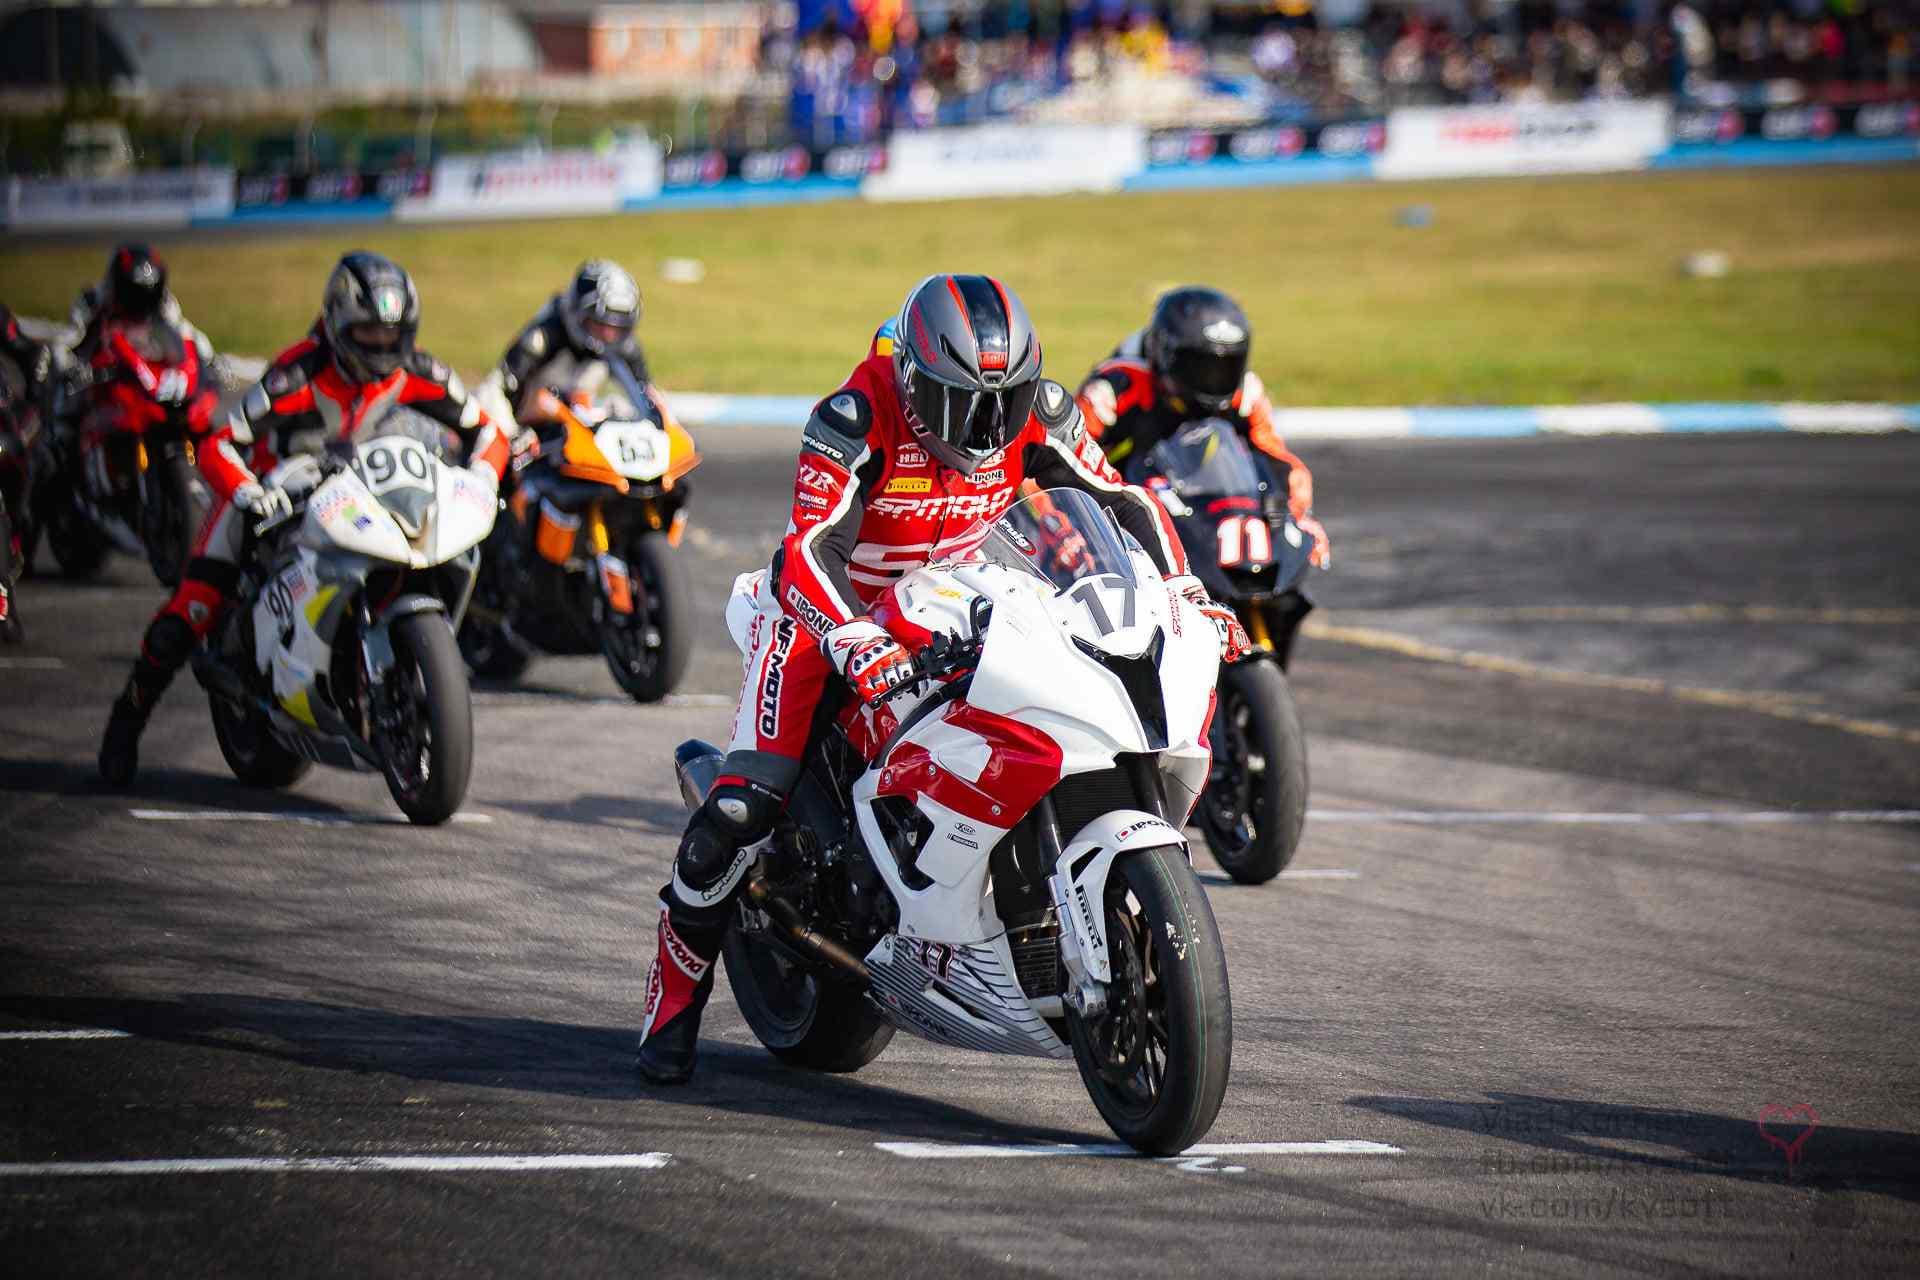 5-6_etap_MotoGPUkraine_012